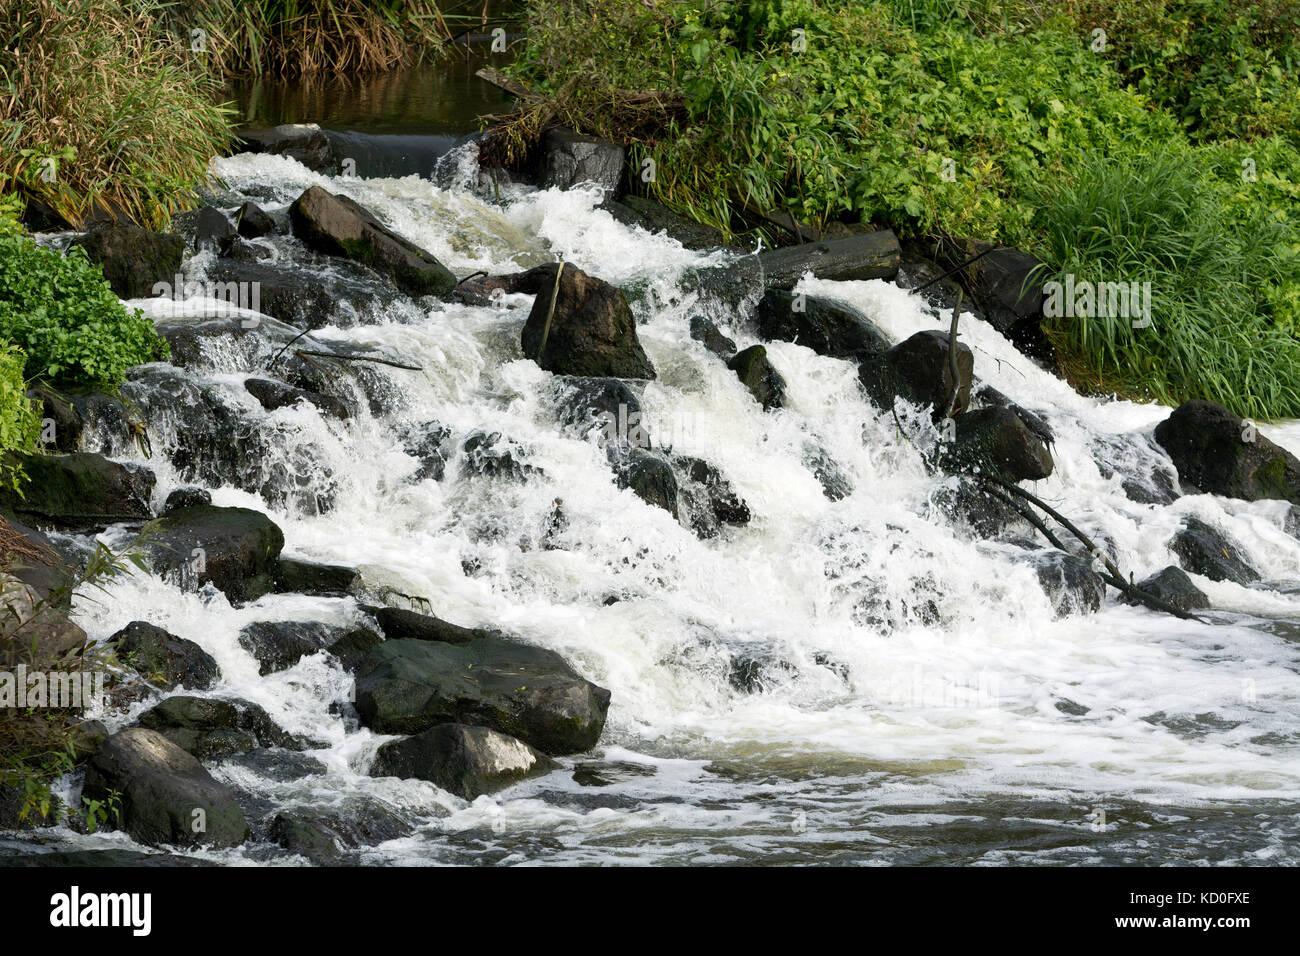 River Avon weir, Luddington, Warwickshire, England, UK - Stock Image